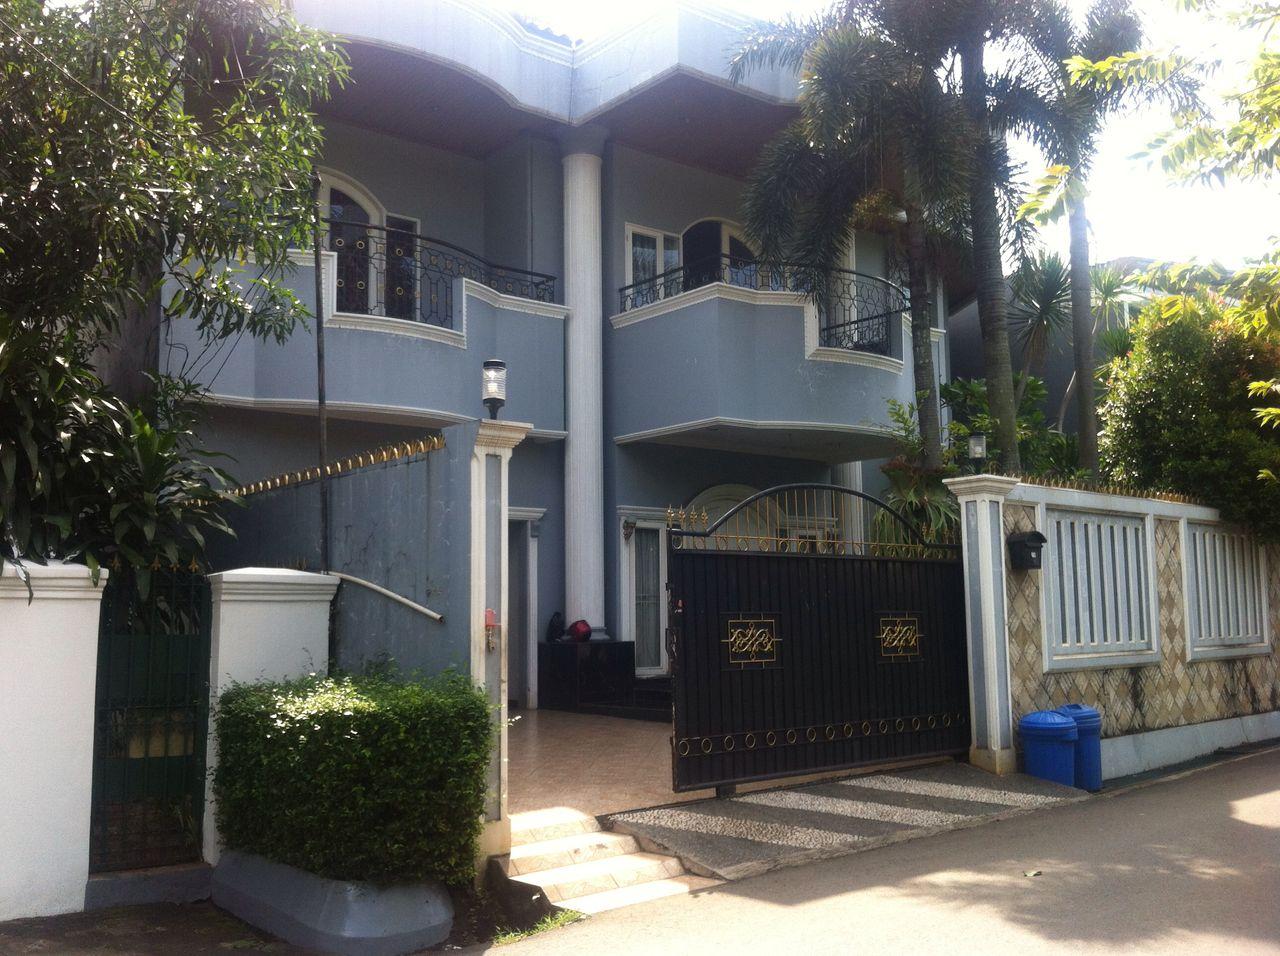 Dijual Rumah asri nyaman, aman, siap huni Di @Cempaka, Bintaro-Jaksel